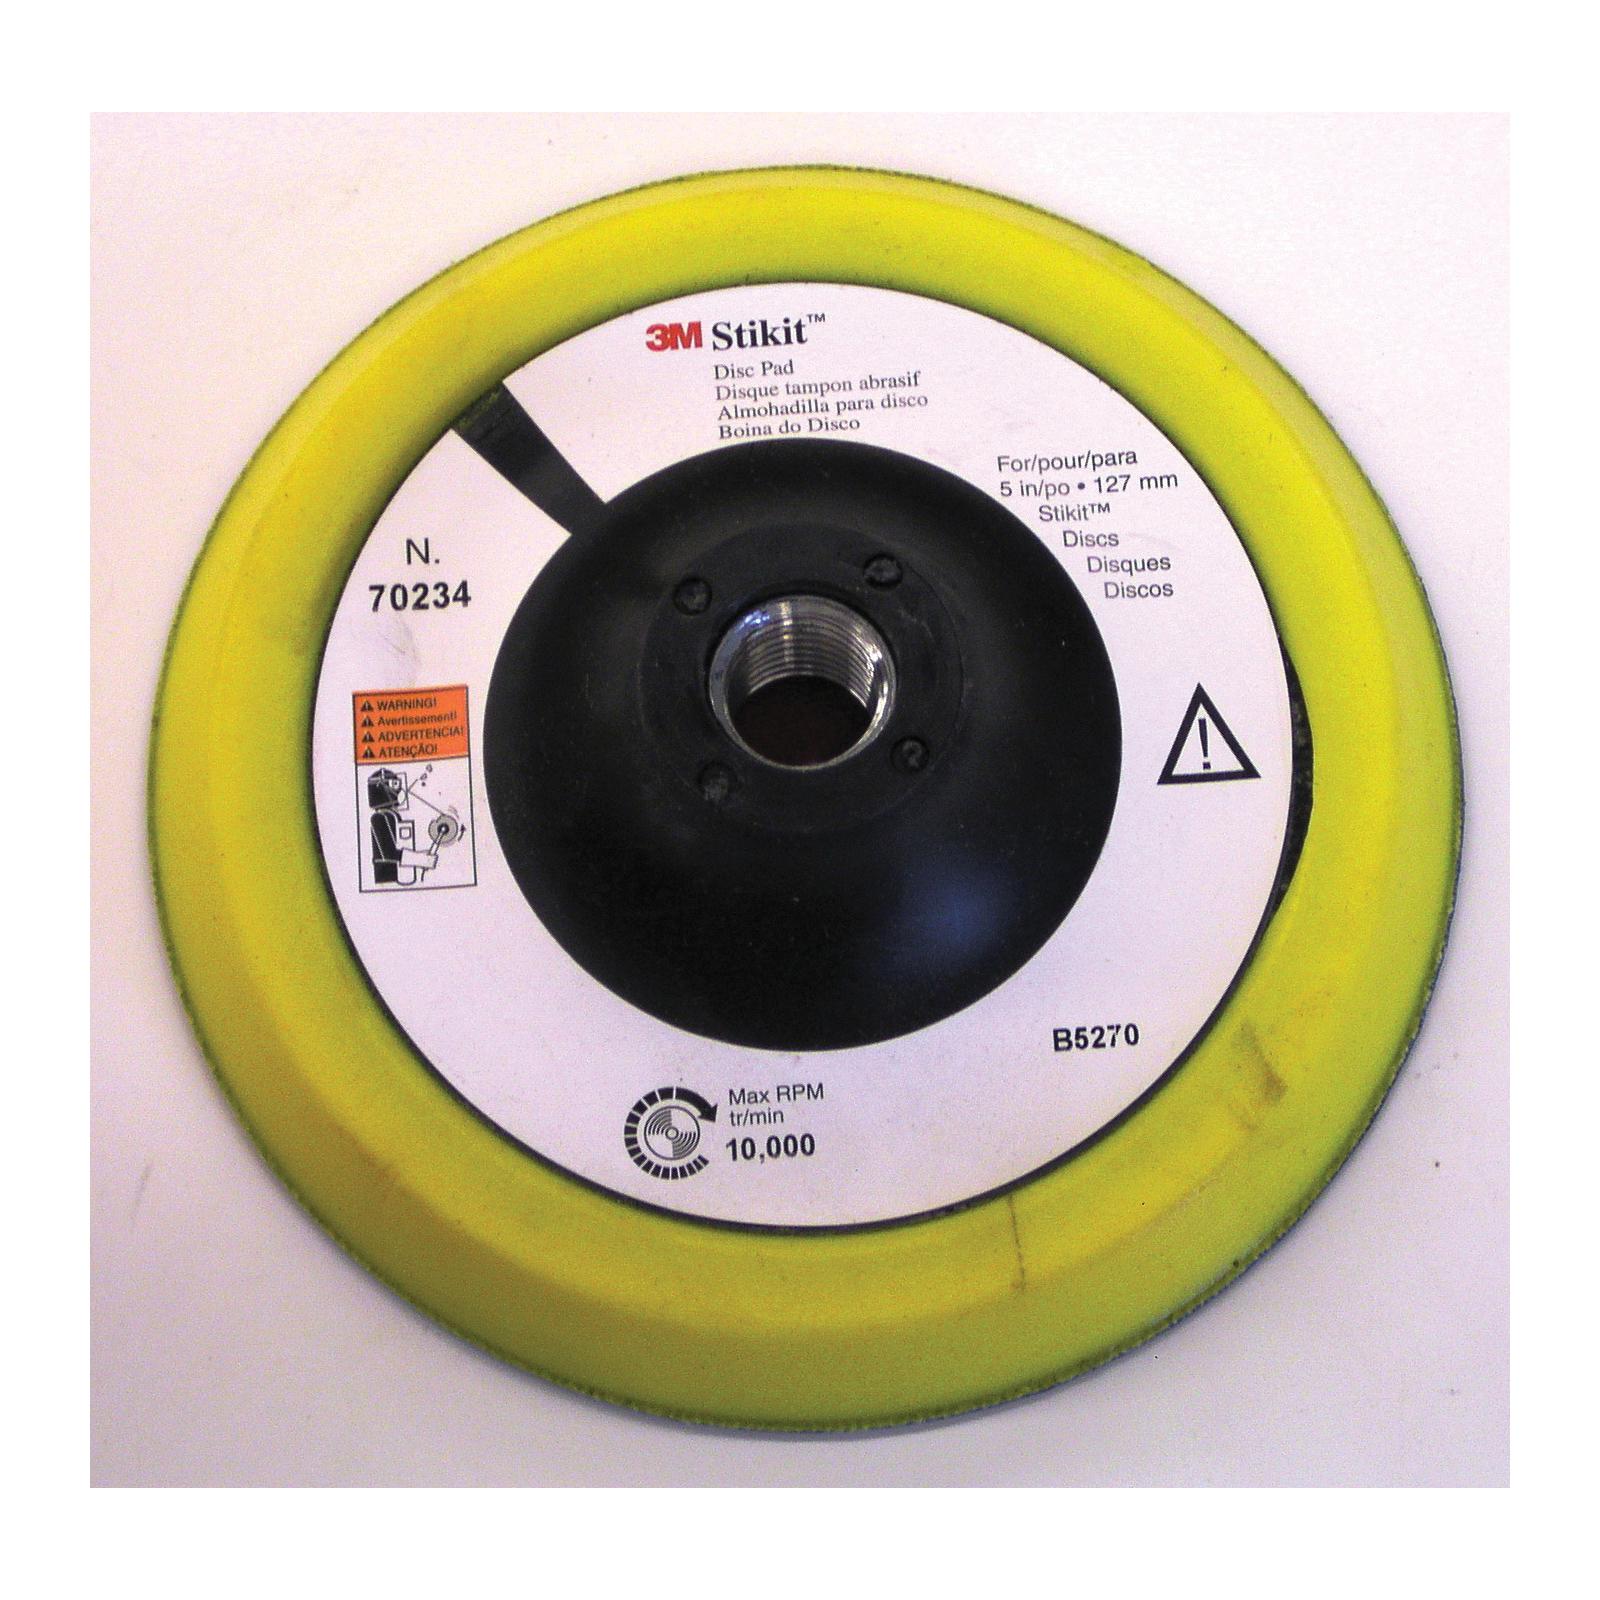 Stikit™ 051111-50453 202DZ General Purpose PSA Straight Flute Machine Tap, 5 in Dia Disc, P150 Grit, Very Fine Grade, Aluminum Oxide Abrasive, Cloth Backing